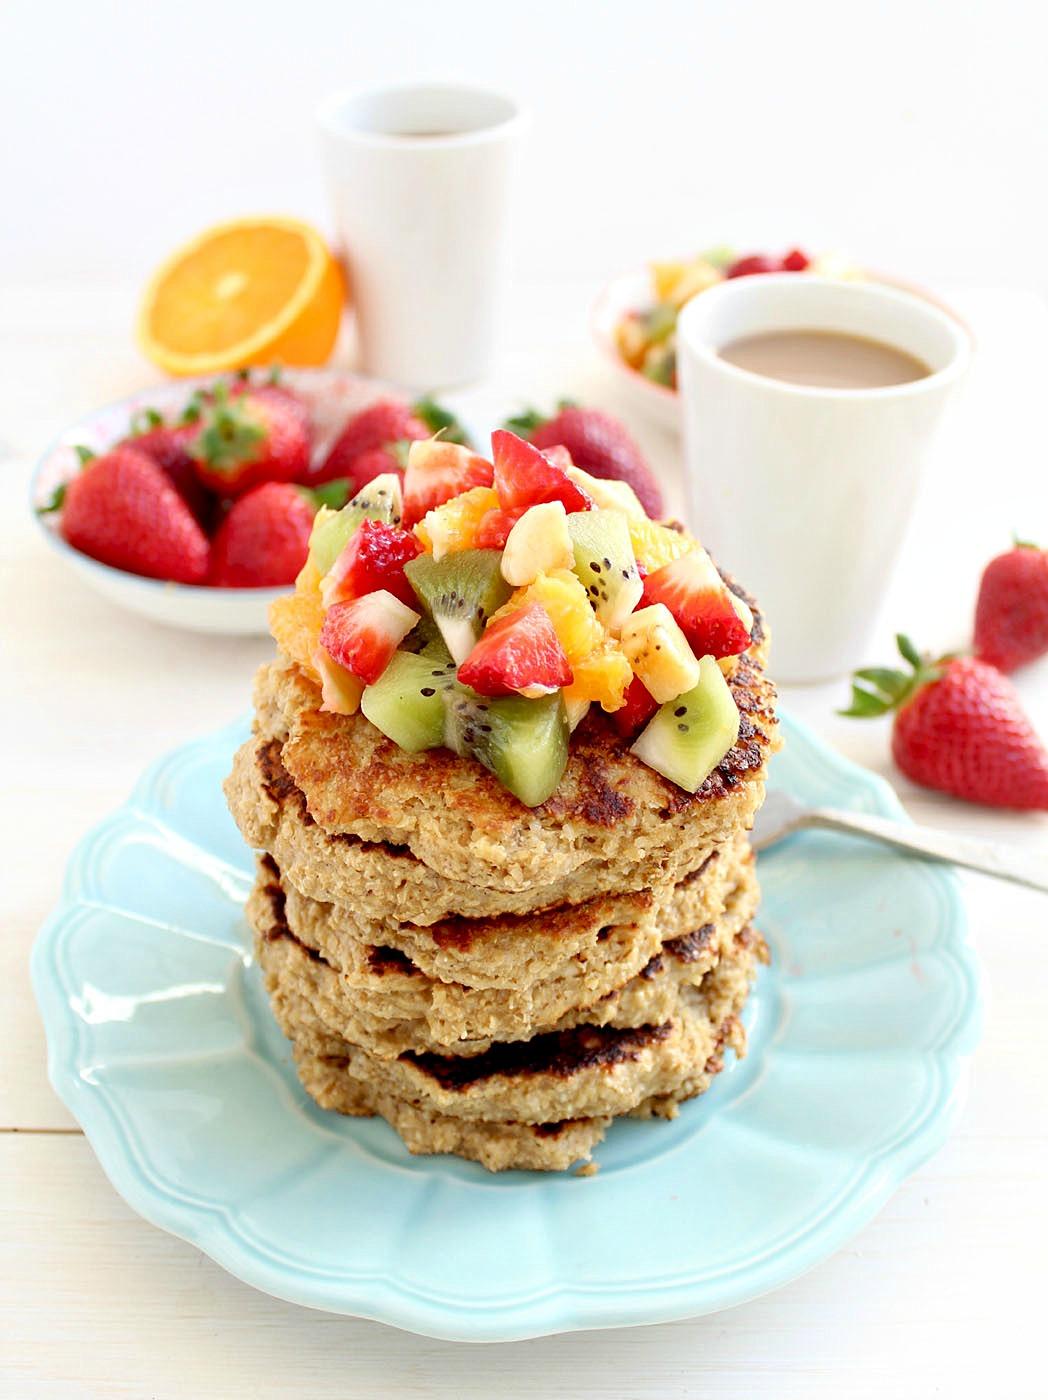 Oat Bran Protein Pancakes